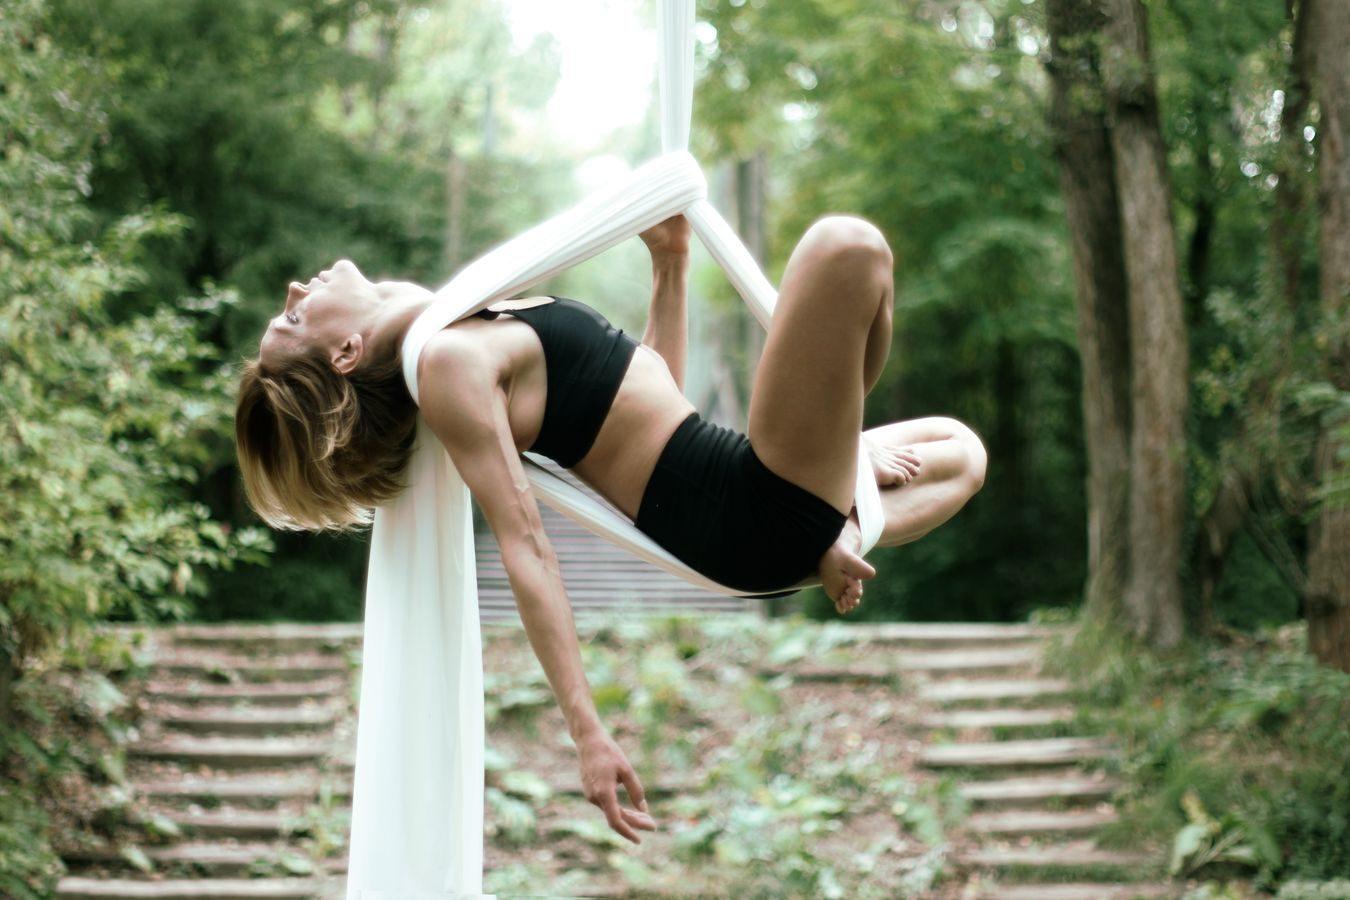 Silk hamok in open air